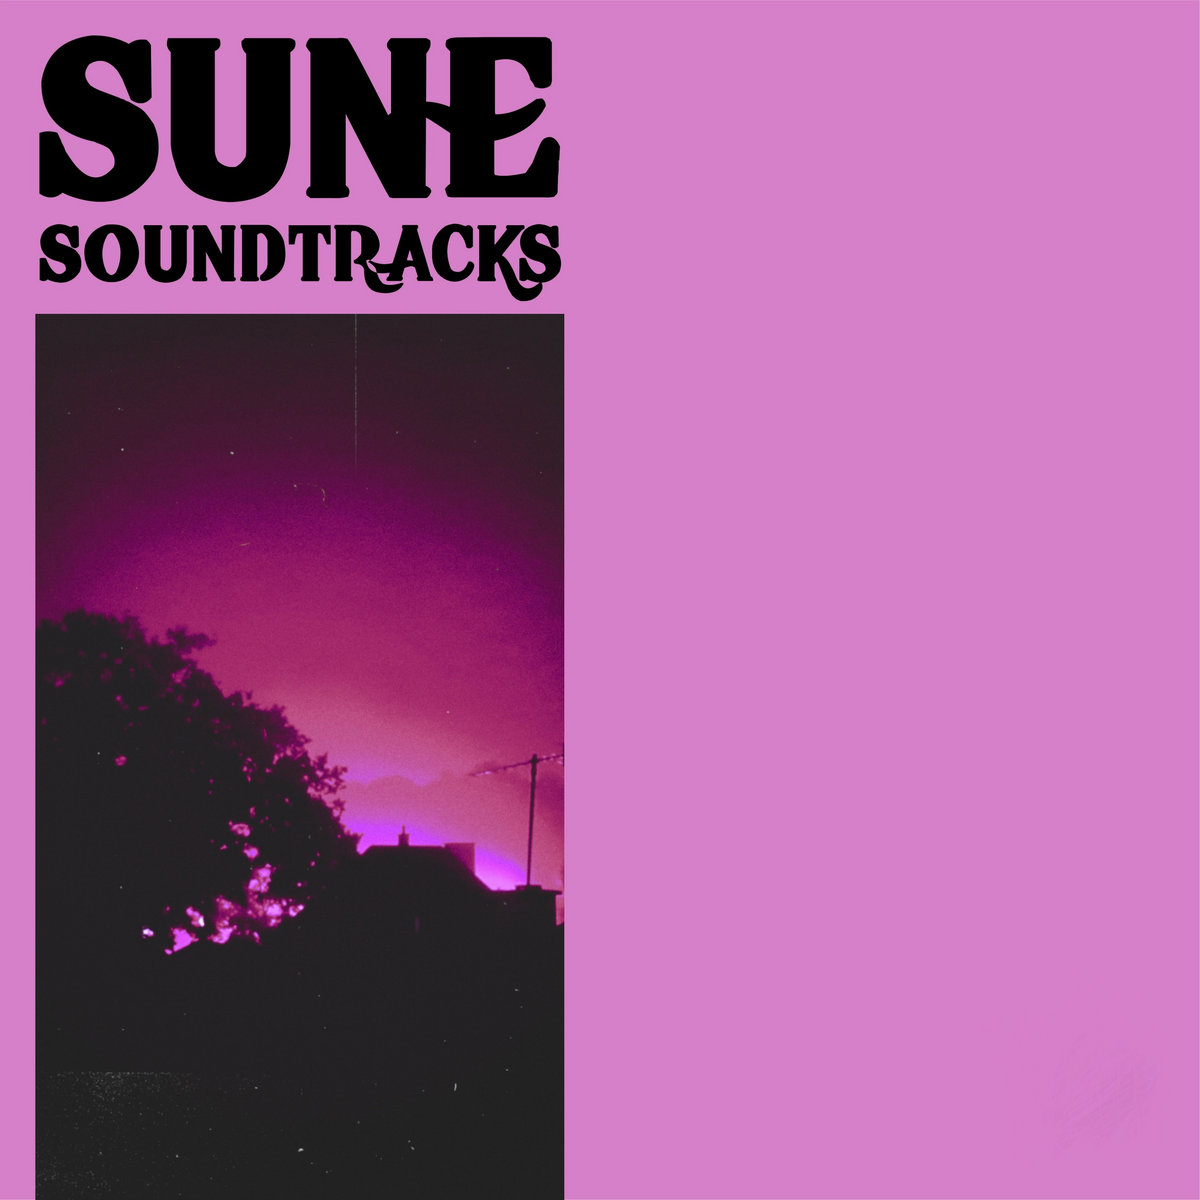 sune soundtracks [głowa konia nagrania;2021]